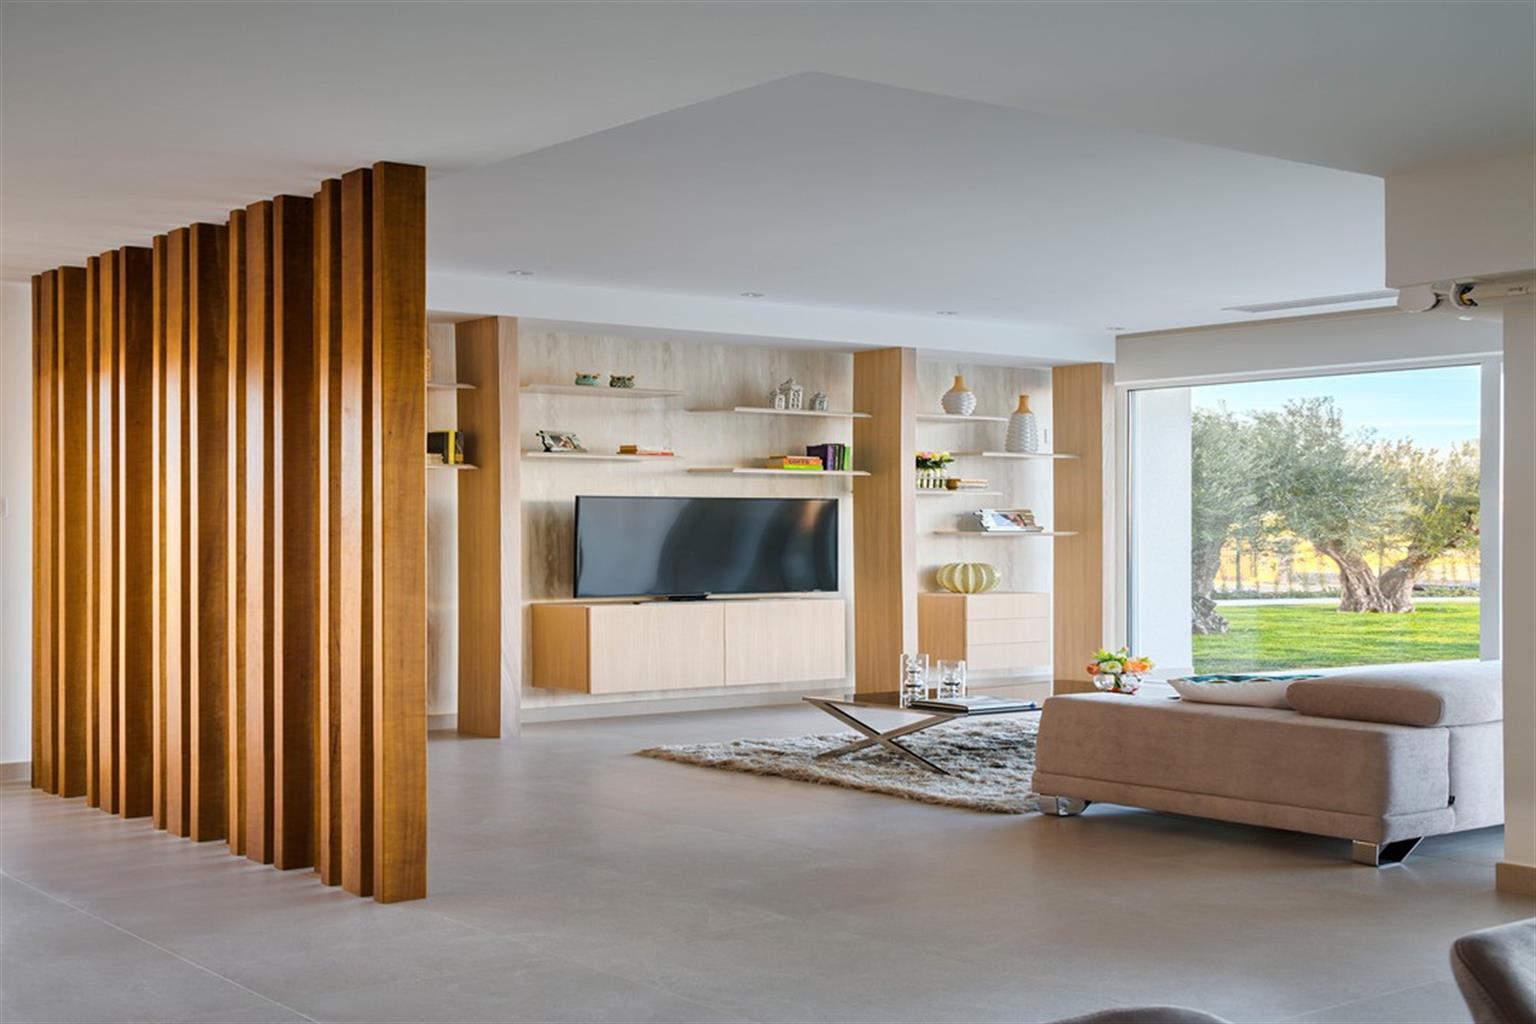 Maison - Villamartin - #4228155-31